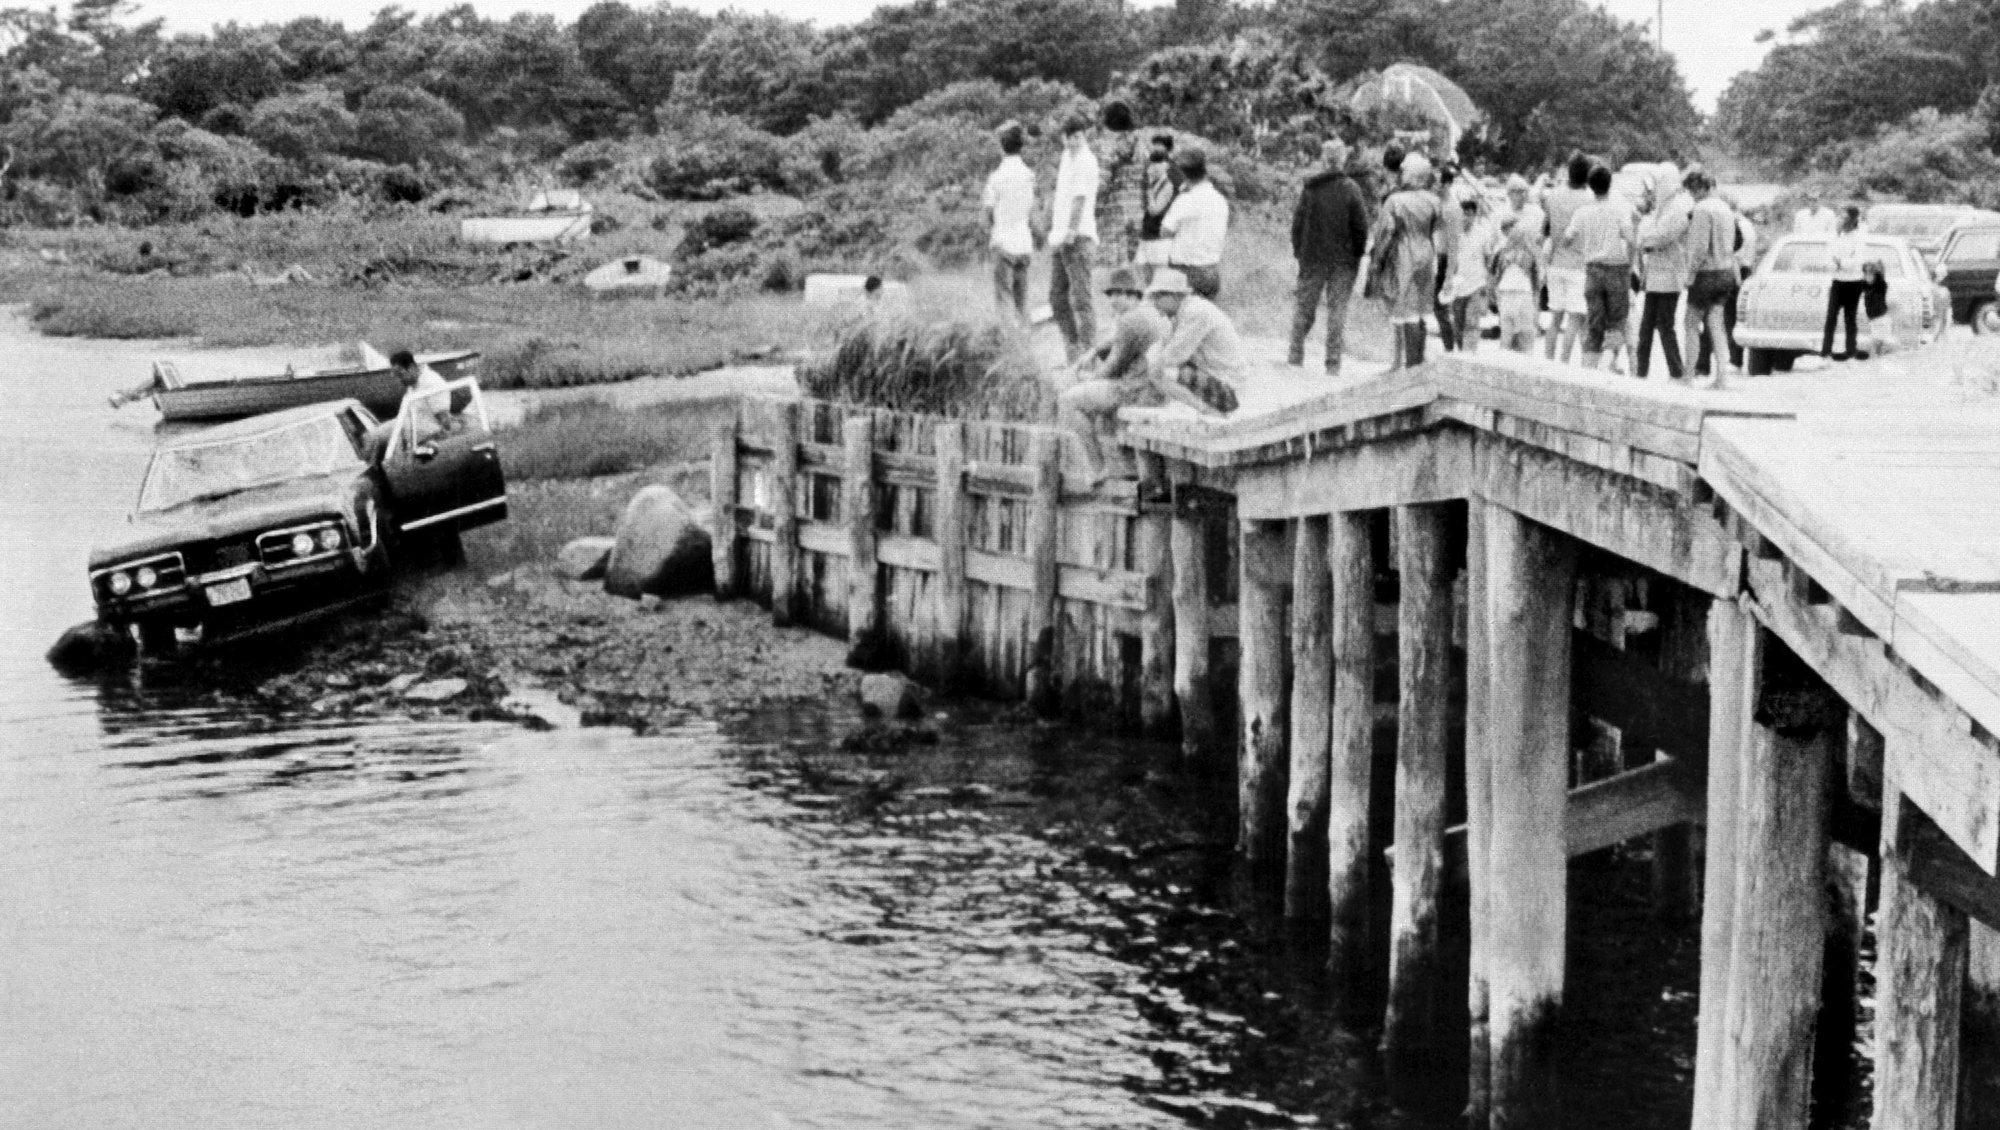 AP Was There: Sen. Kennedy's fateful crash on Chappaquiddick